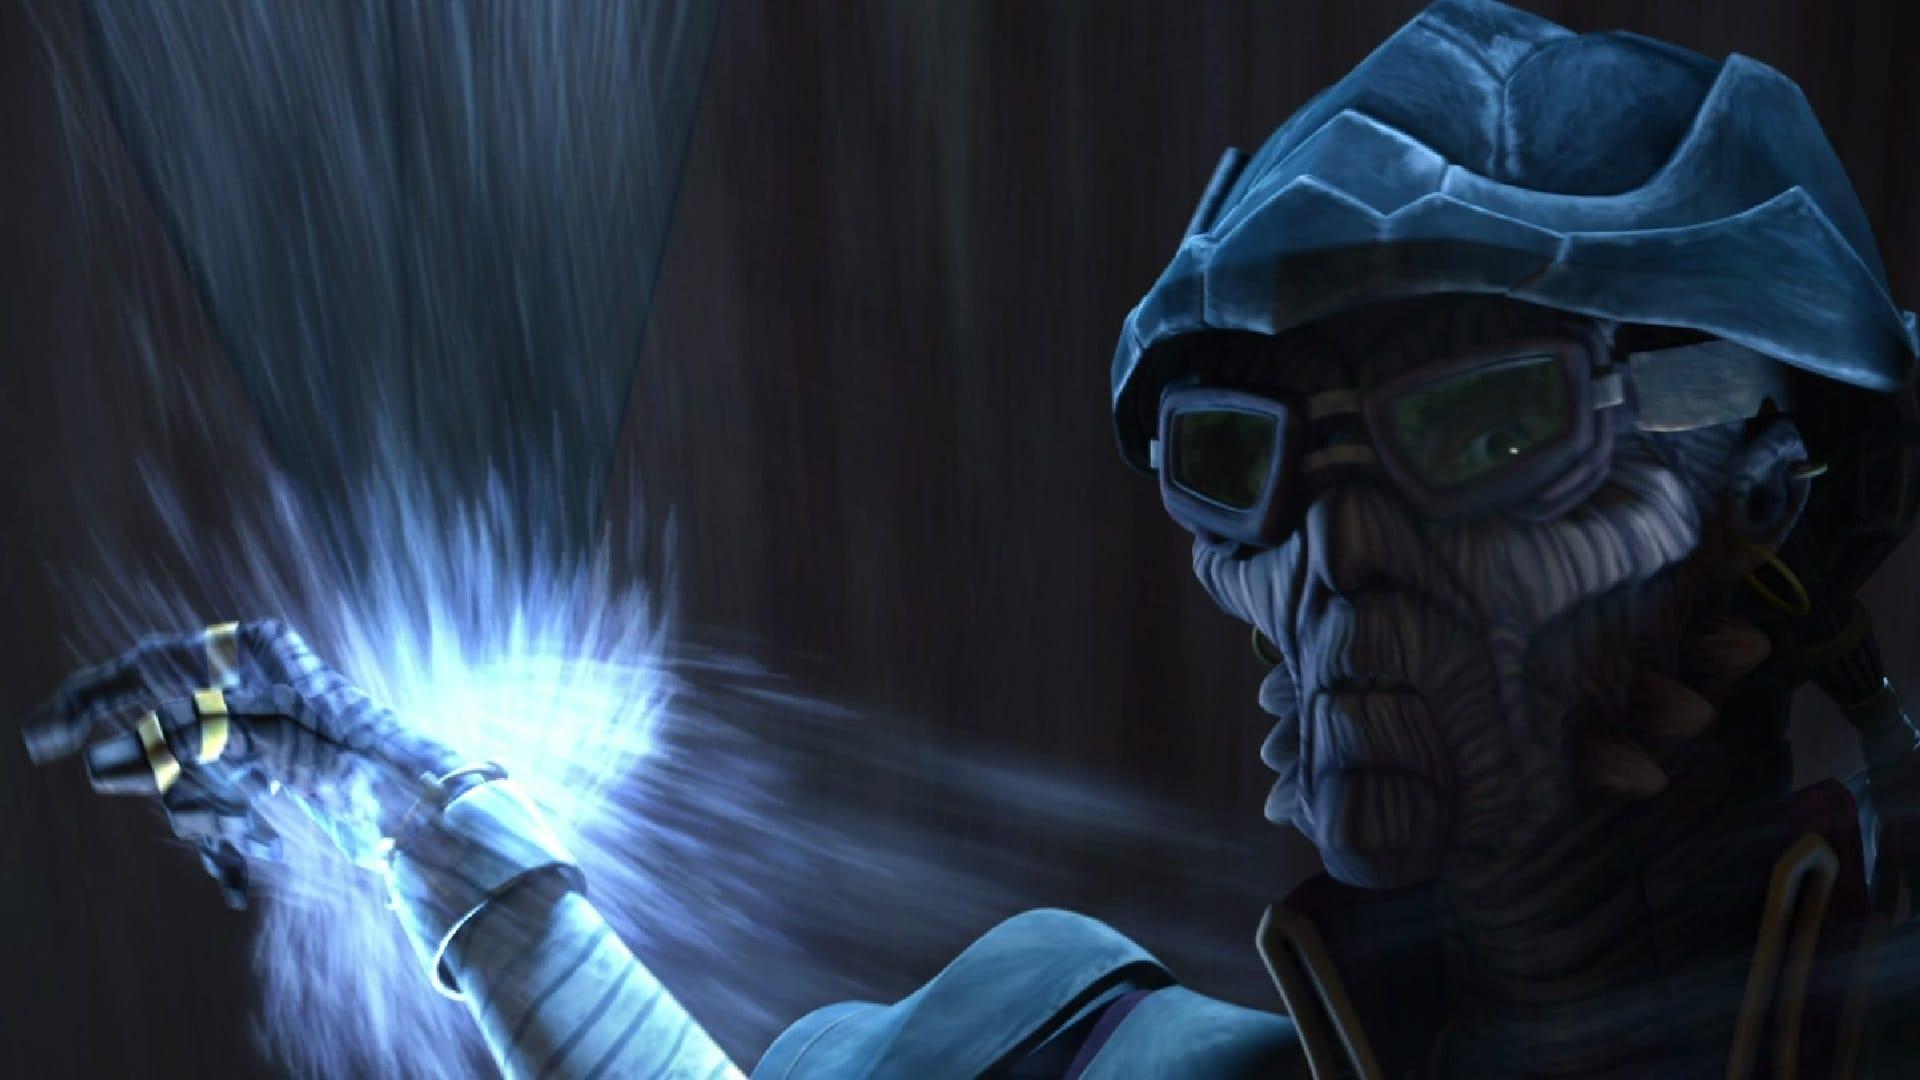 Star Wars: The Clone Wars - Season 5 Episode 9 : A Necessary Bond